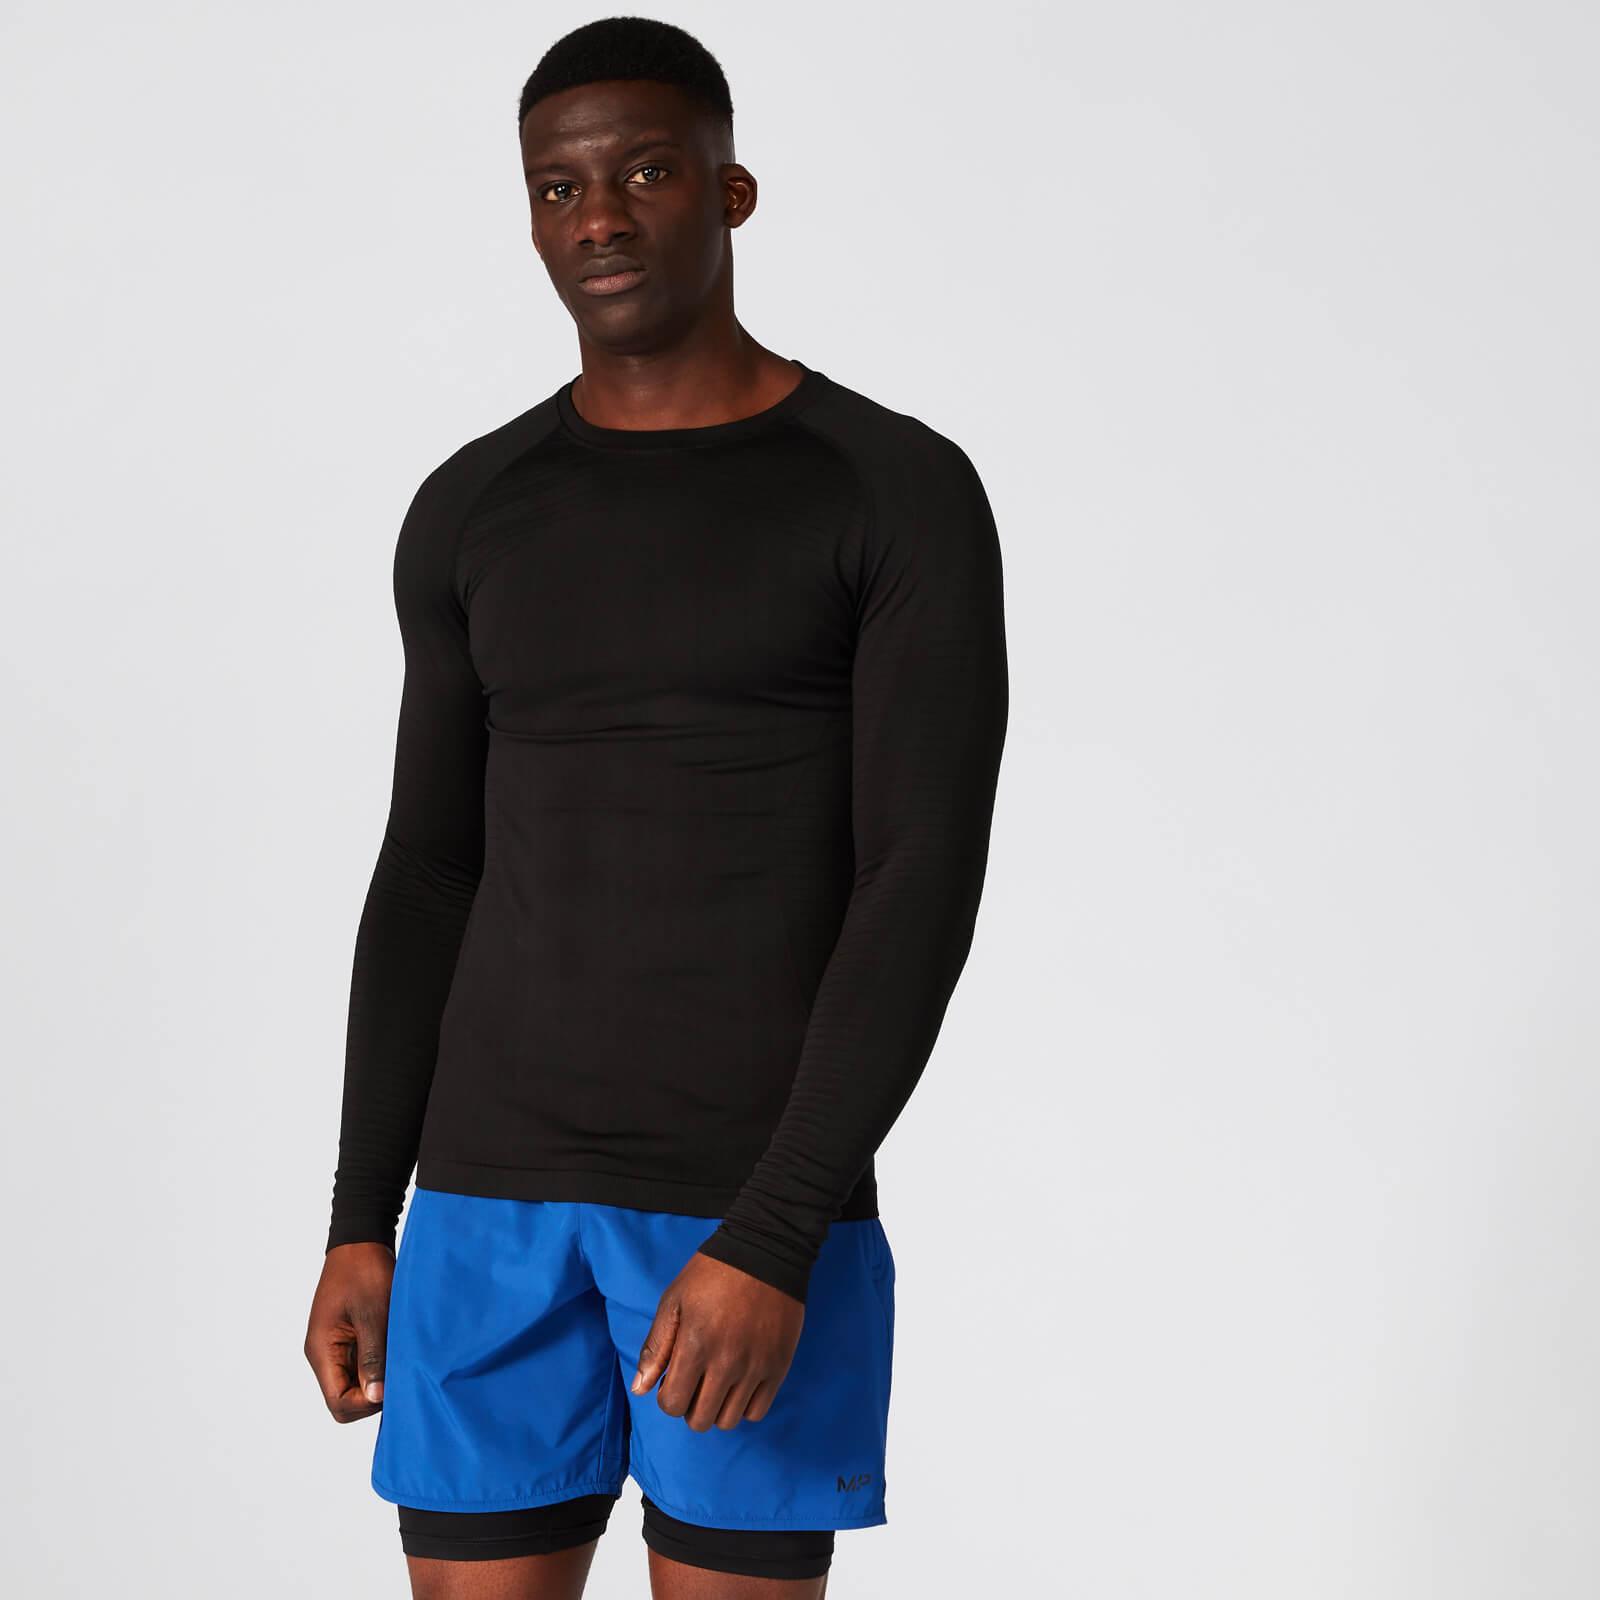 Myprotein Elite Seamless Long-Sleeve T-Shirt – Black - XXL